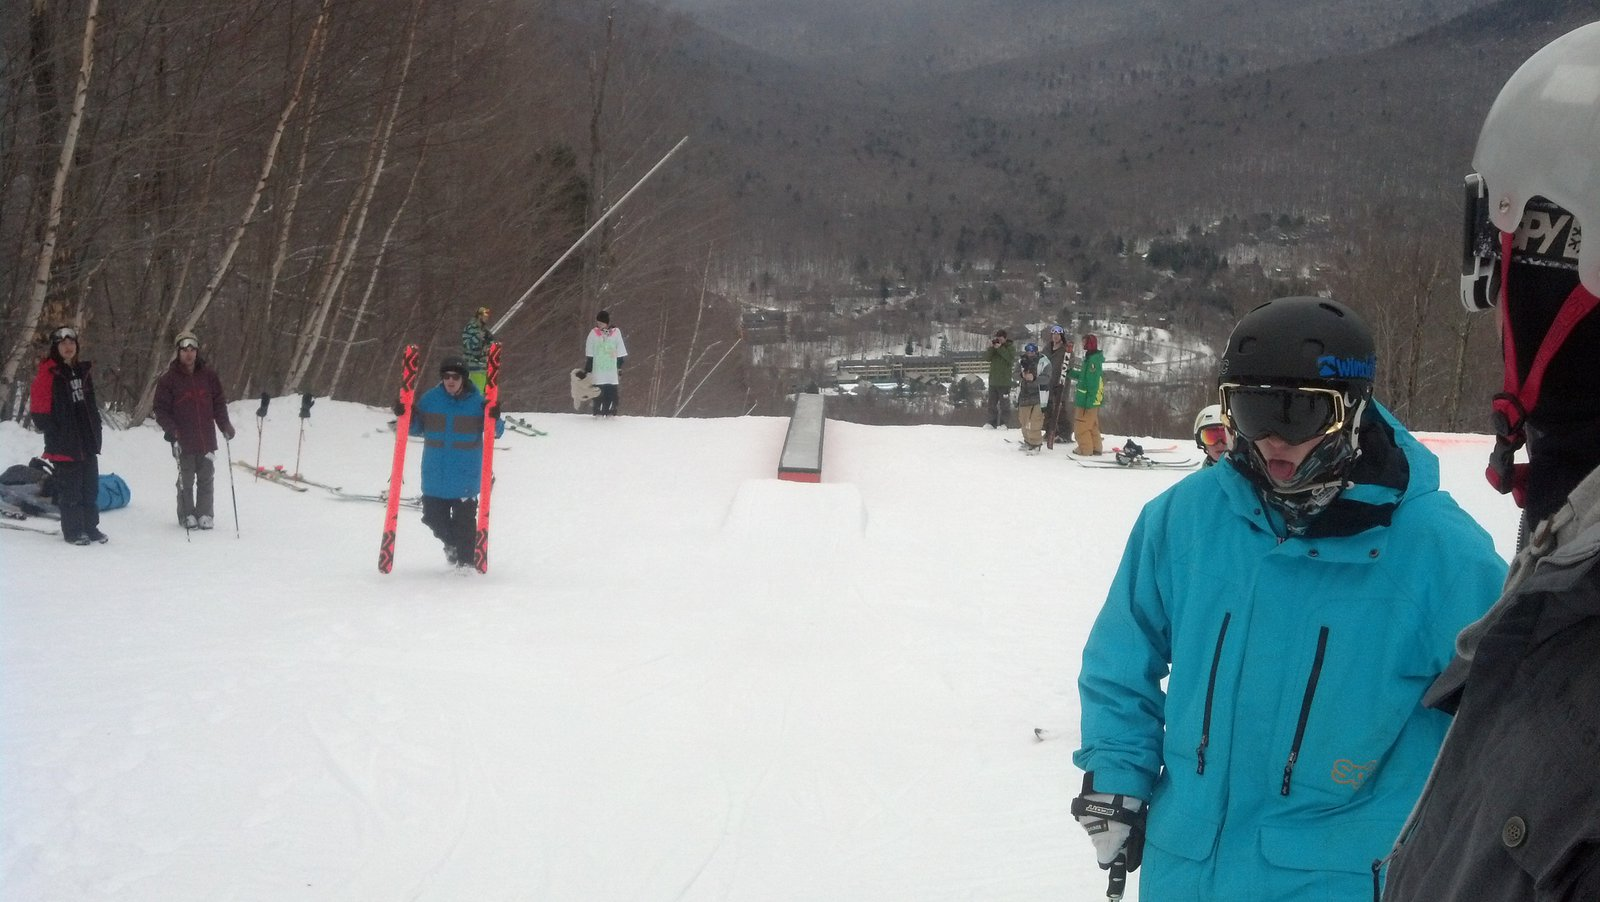 Game of ski on the flat box.